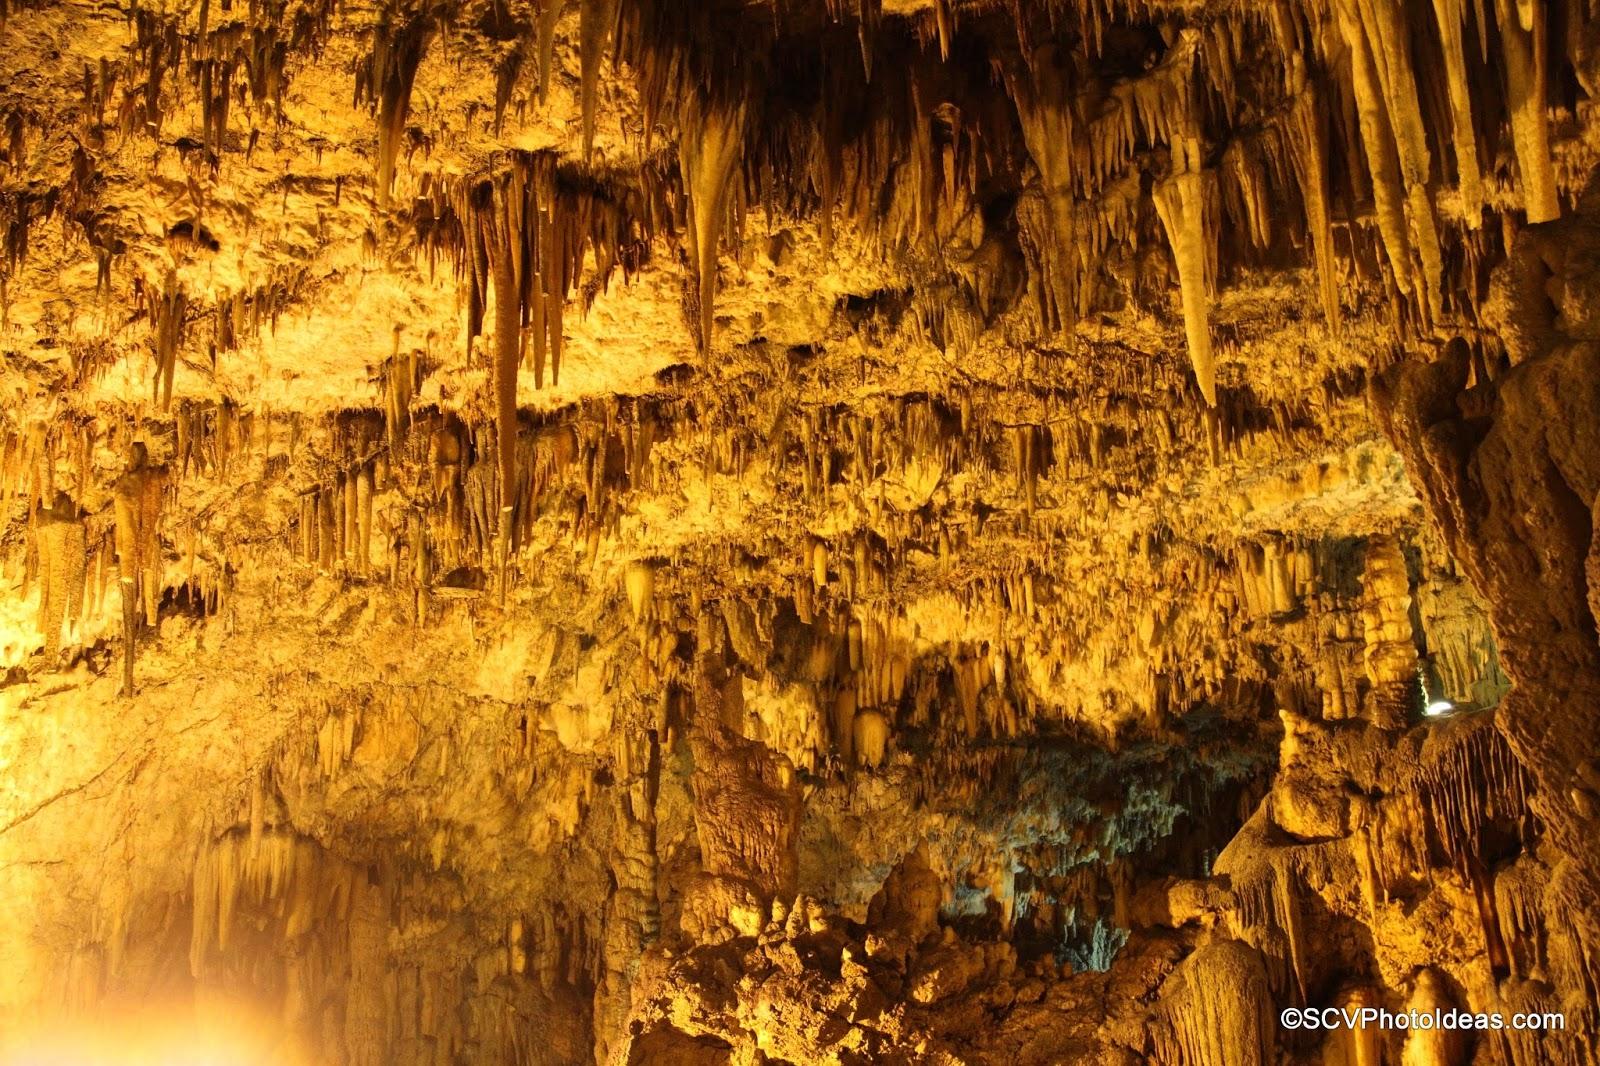 Drogarati Cave main chamber stalactites